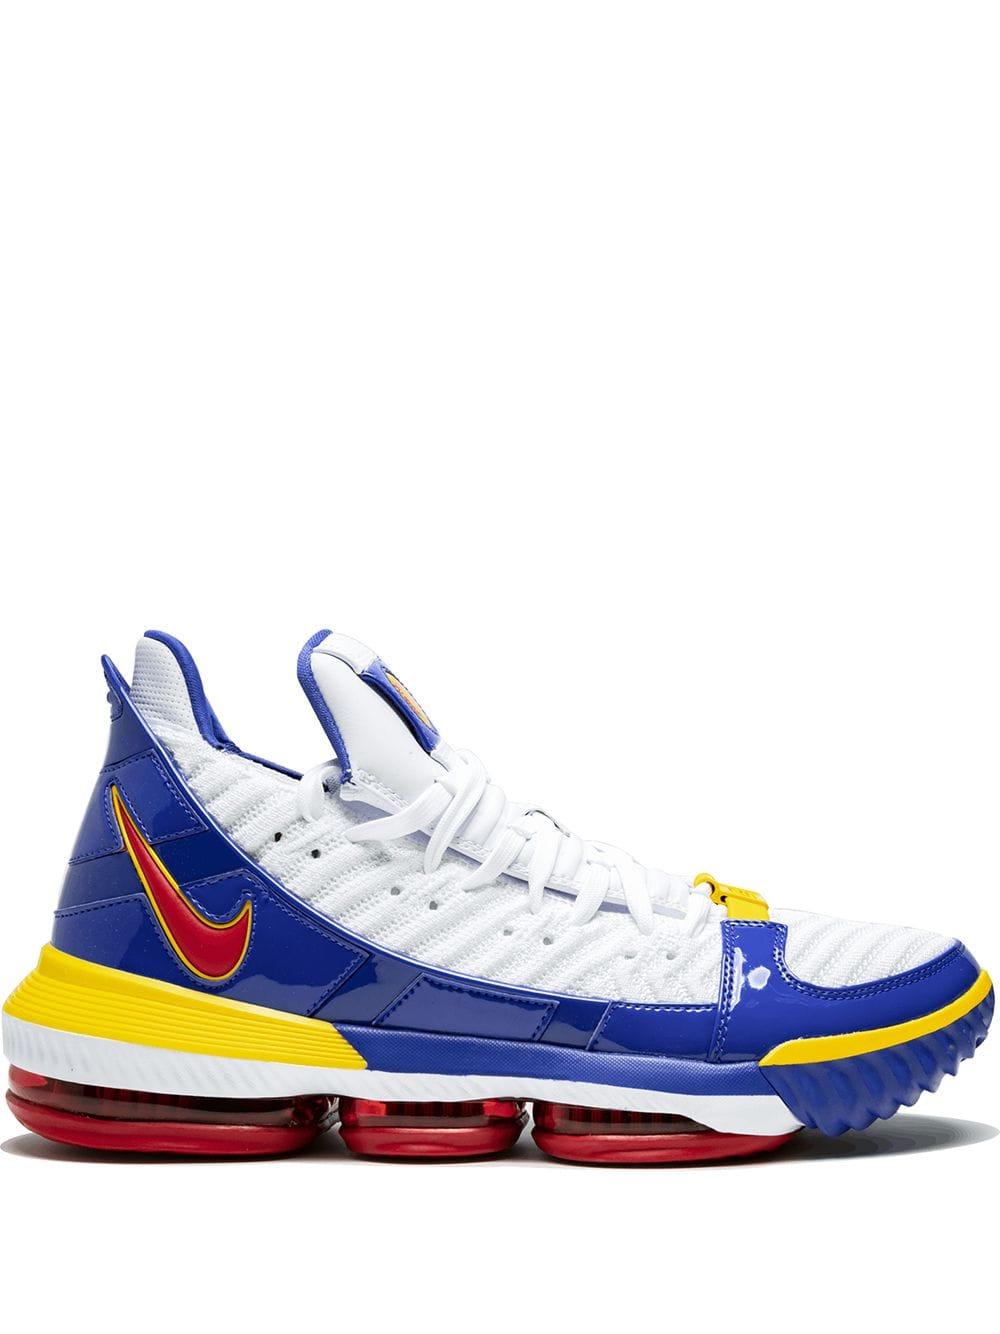 "Nike LeBron 15 ""Waffle Trainer"" Blue Yellow For Sale, Precio"